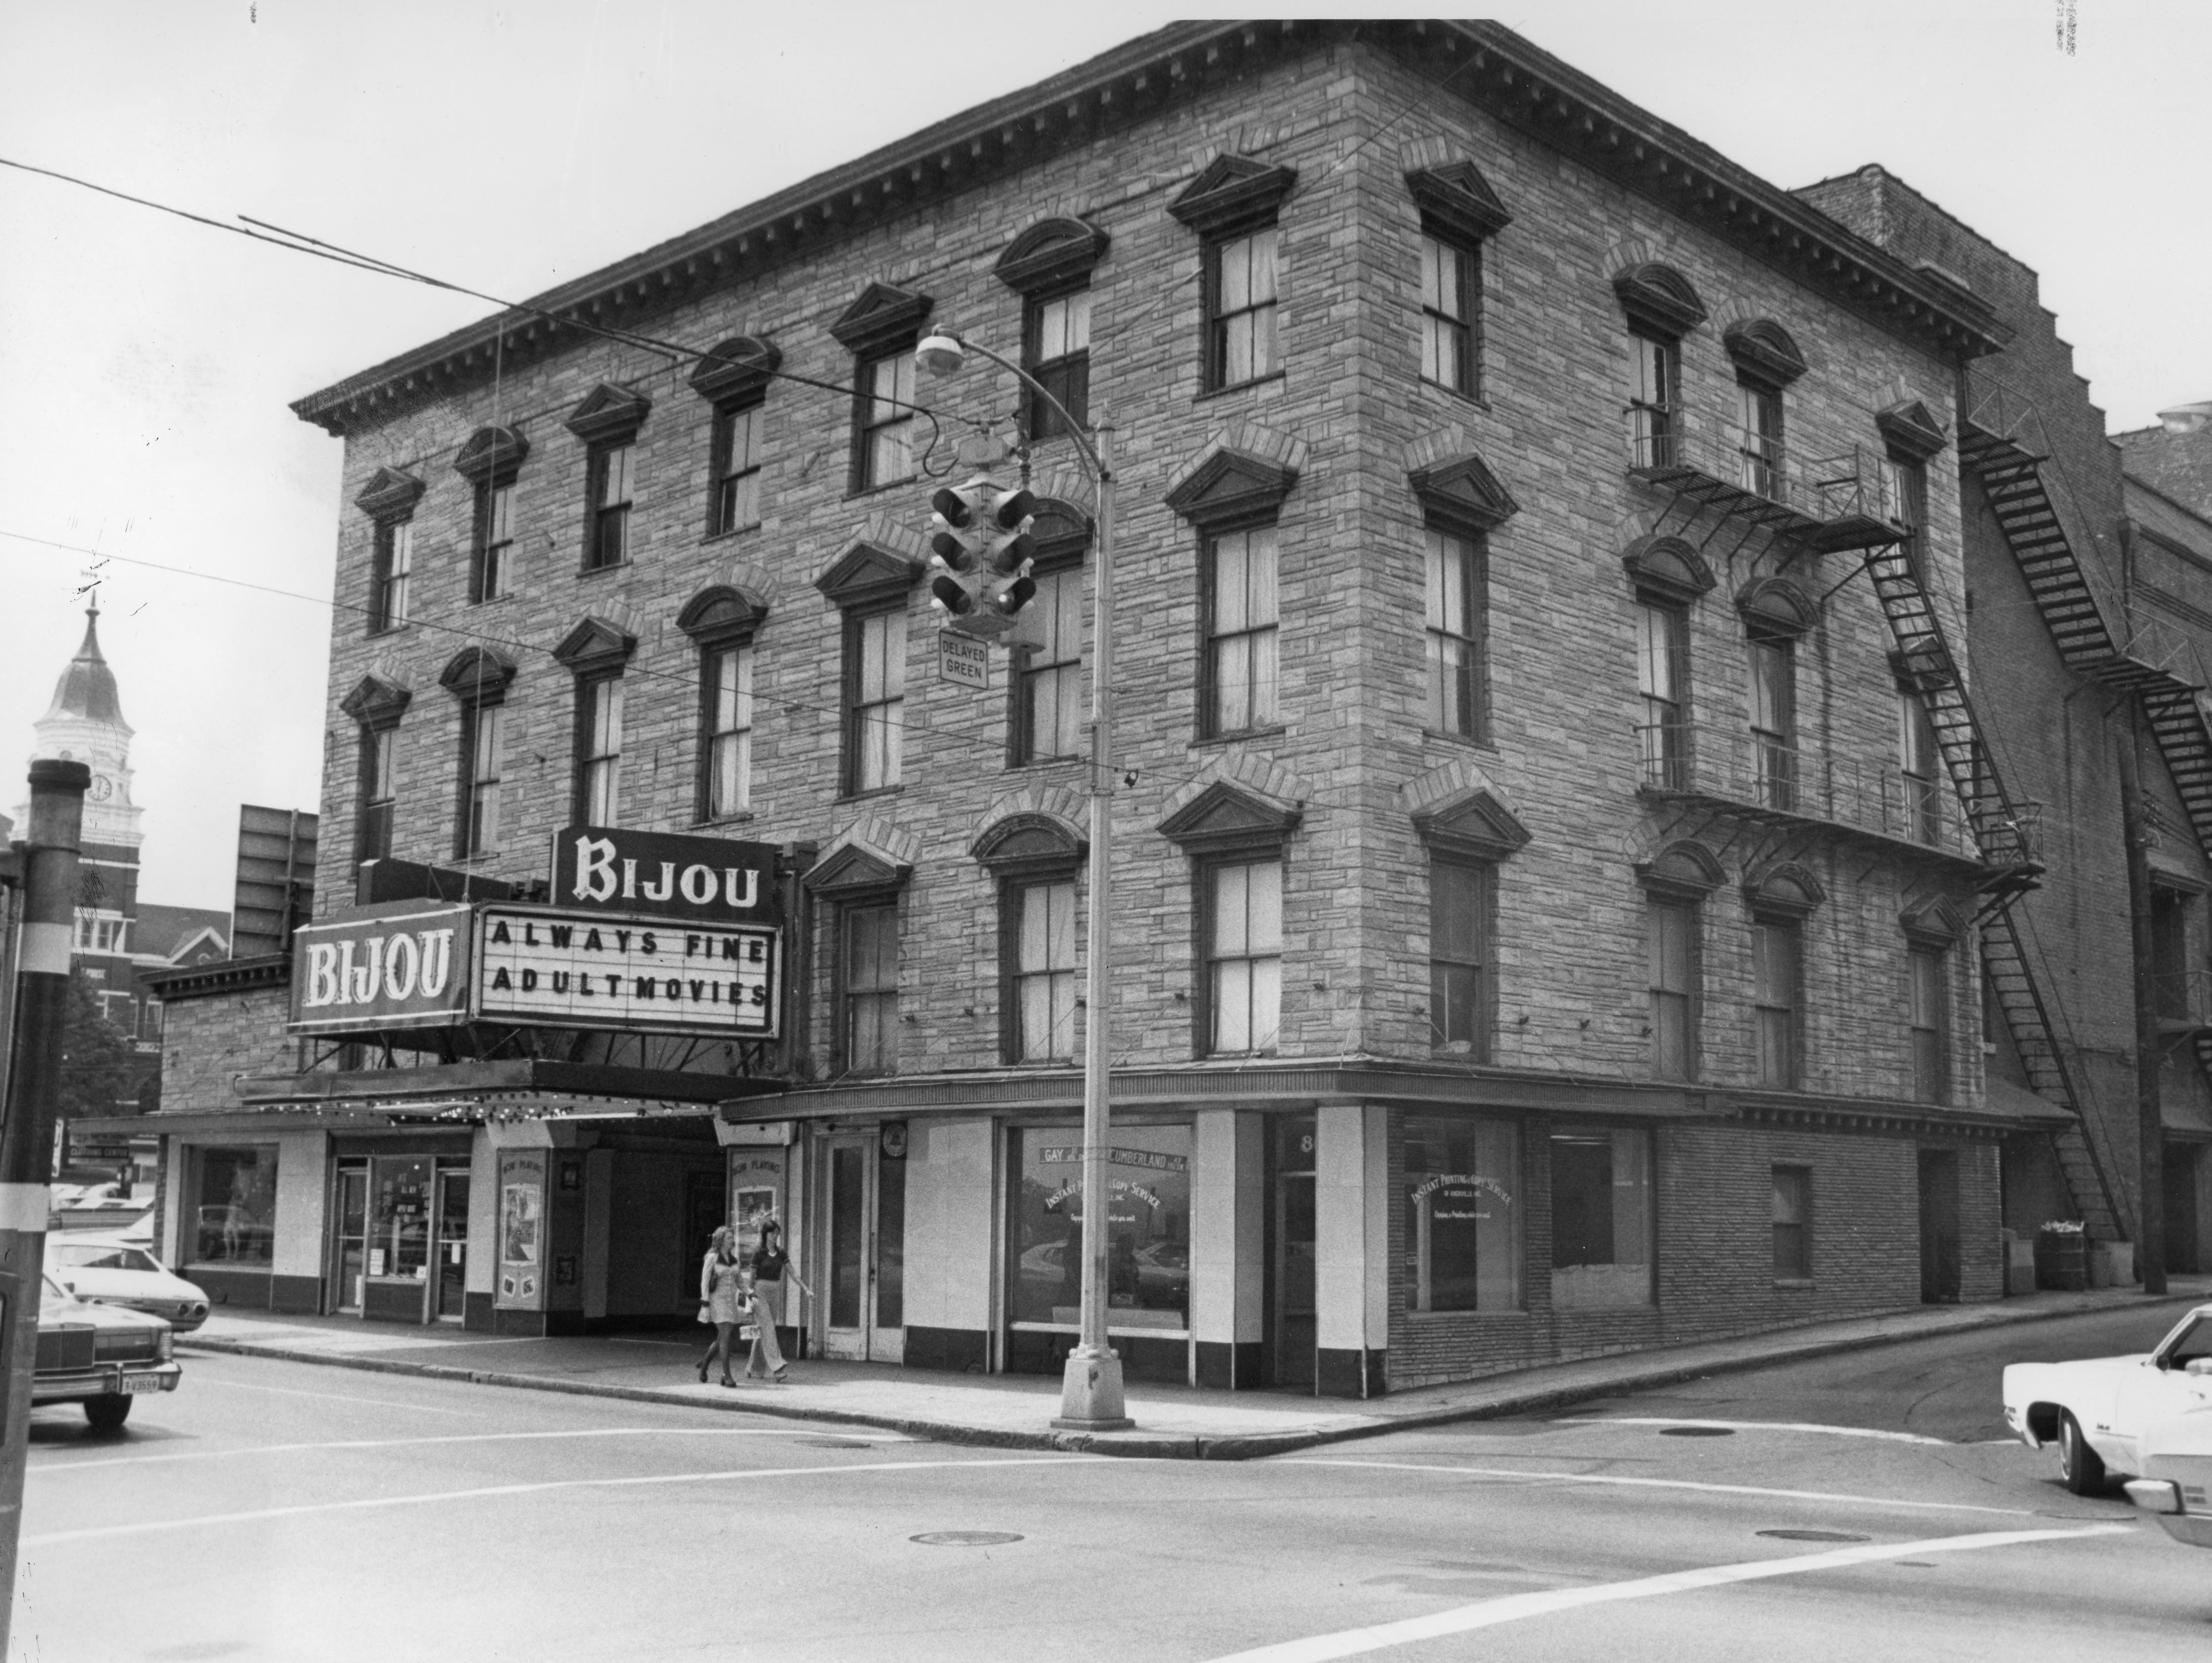 The Bijou Theatre as seen on September 22, 1974.